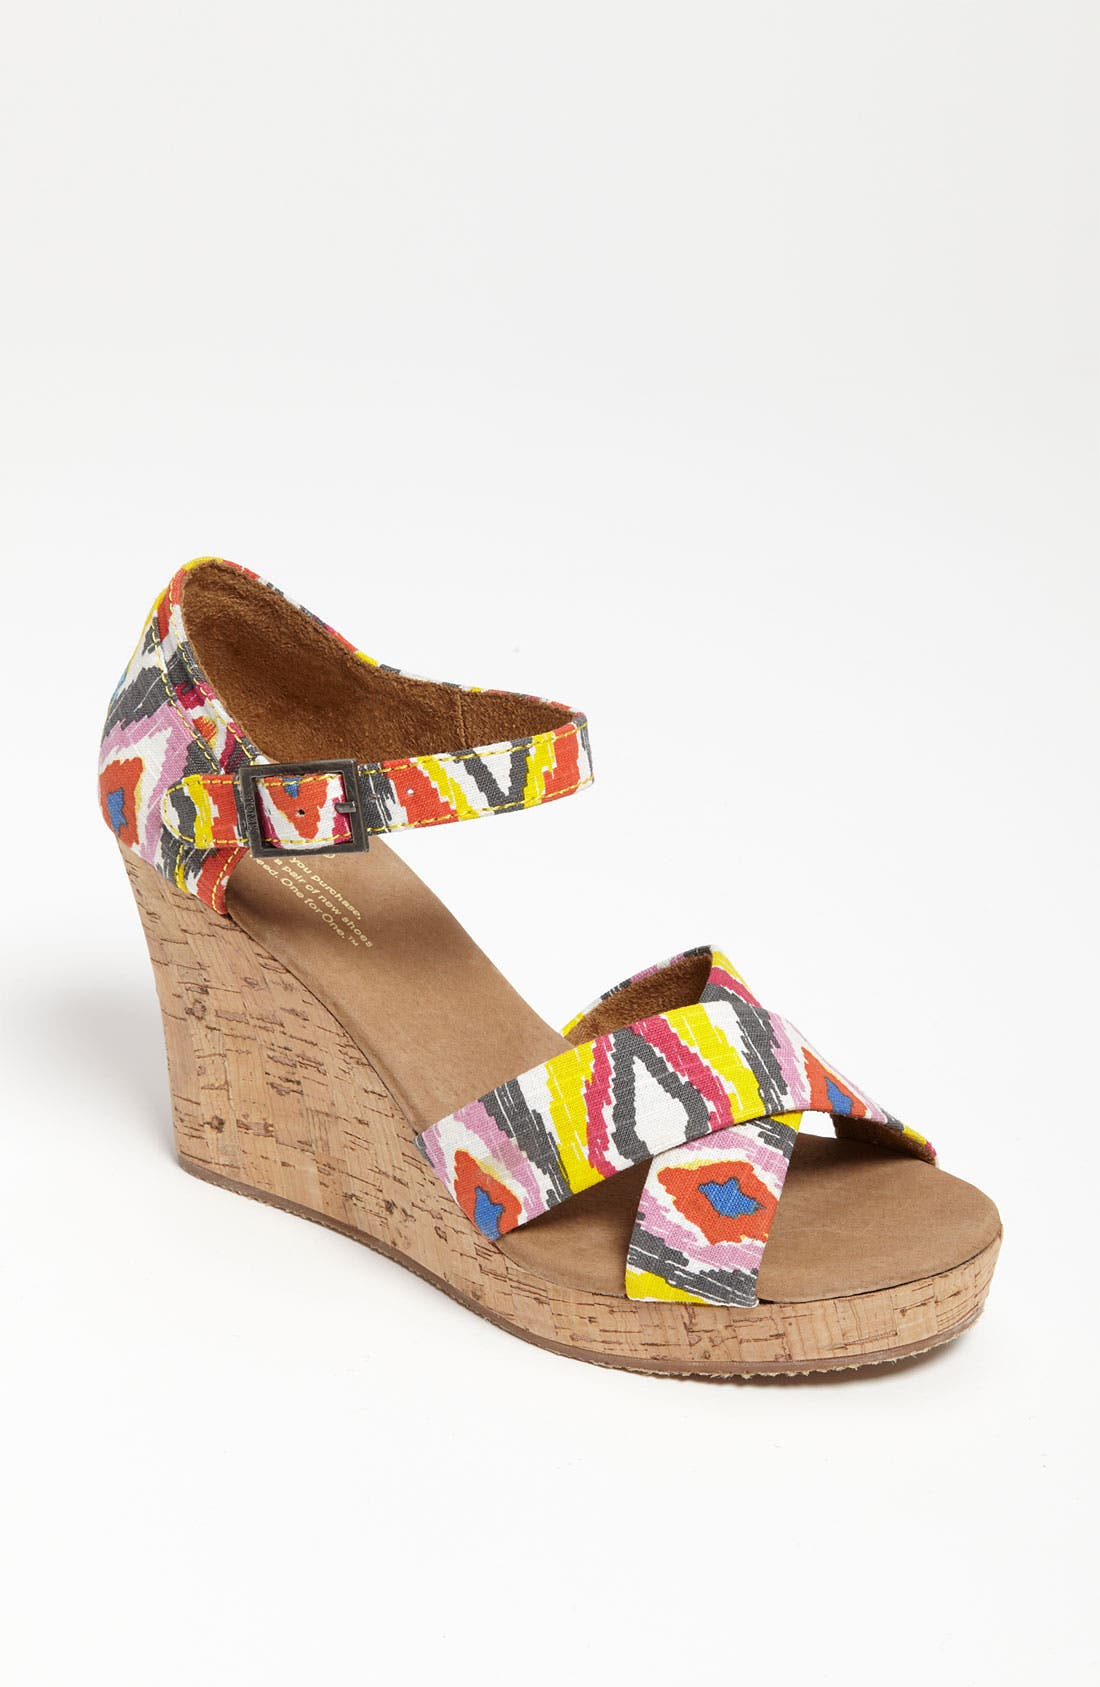 Alternate Image 1 Selected - TOMS 'Cenna' Sandal